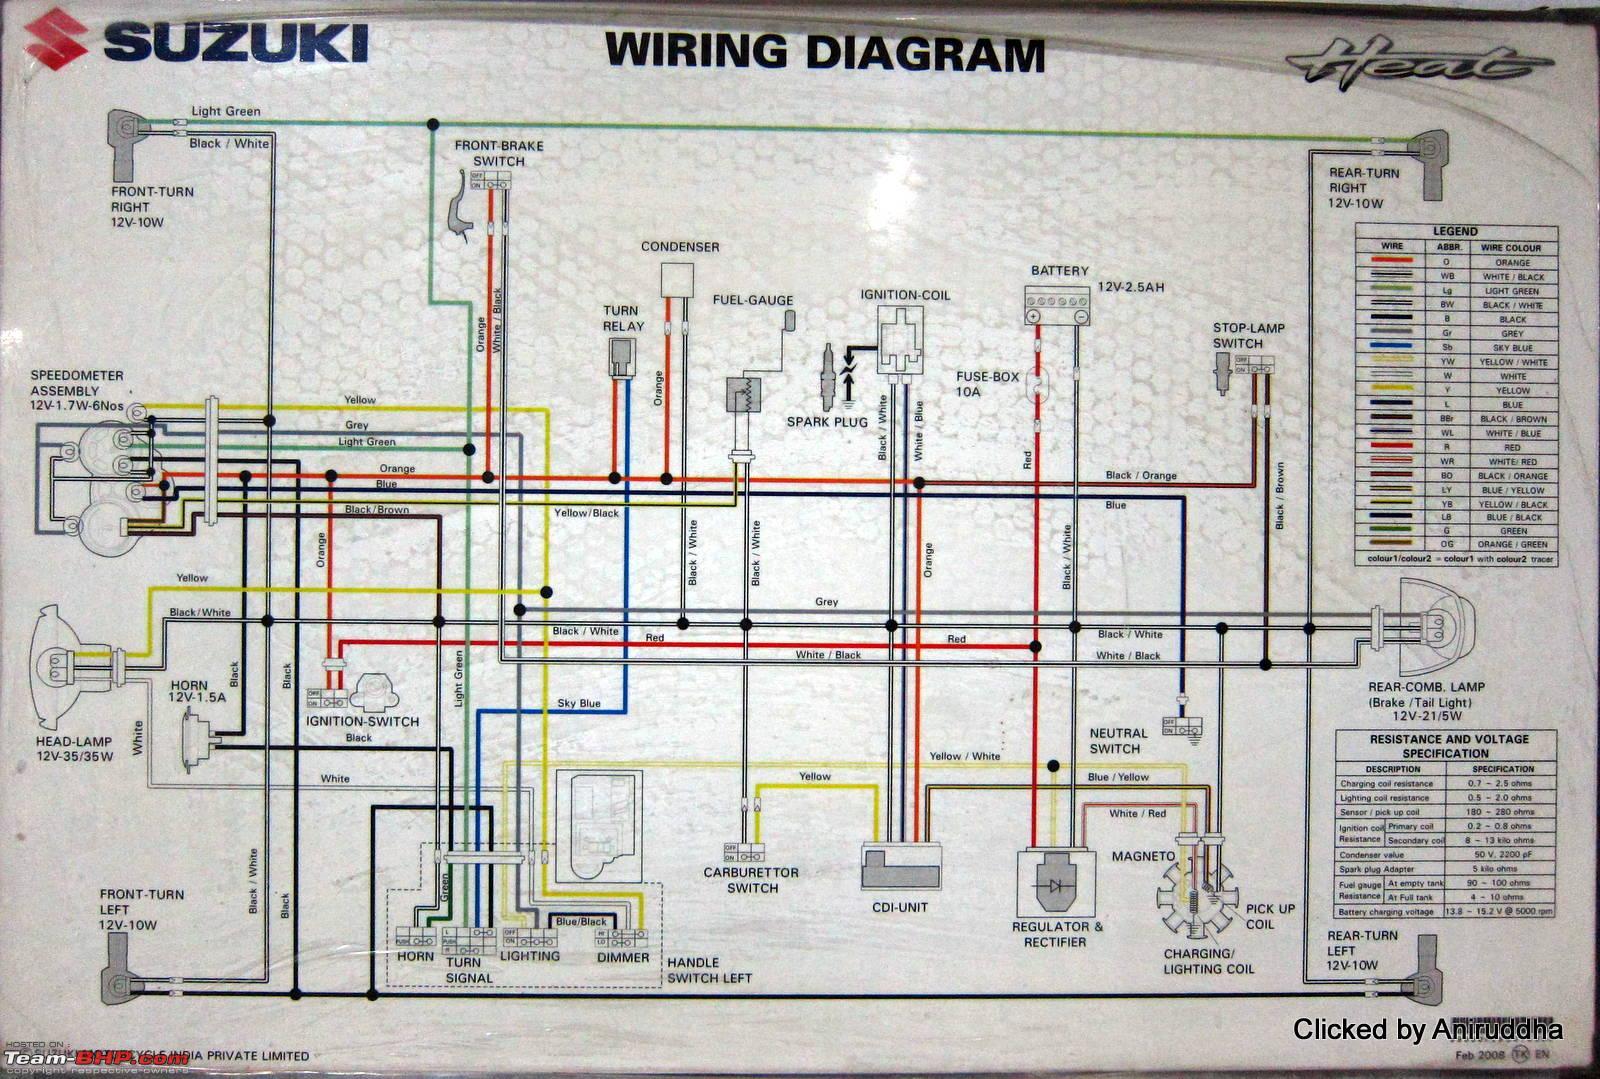 v92c victory wiring diagram honda valkyrie wiring diagram